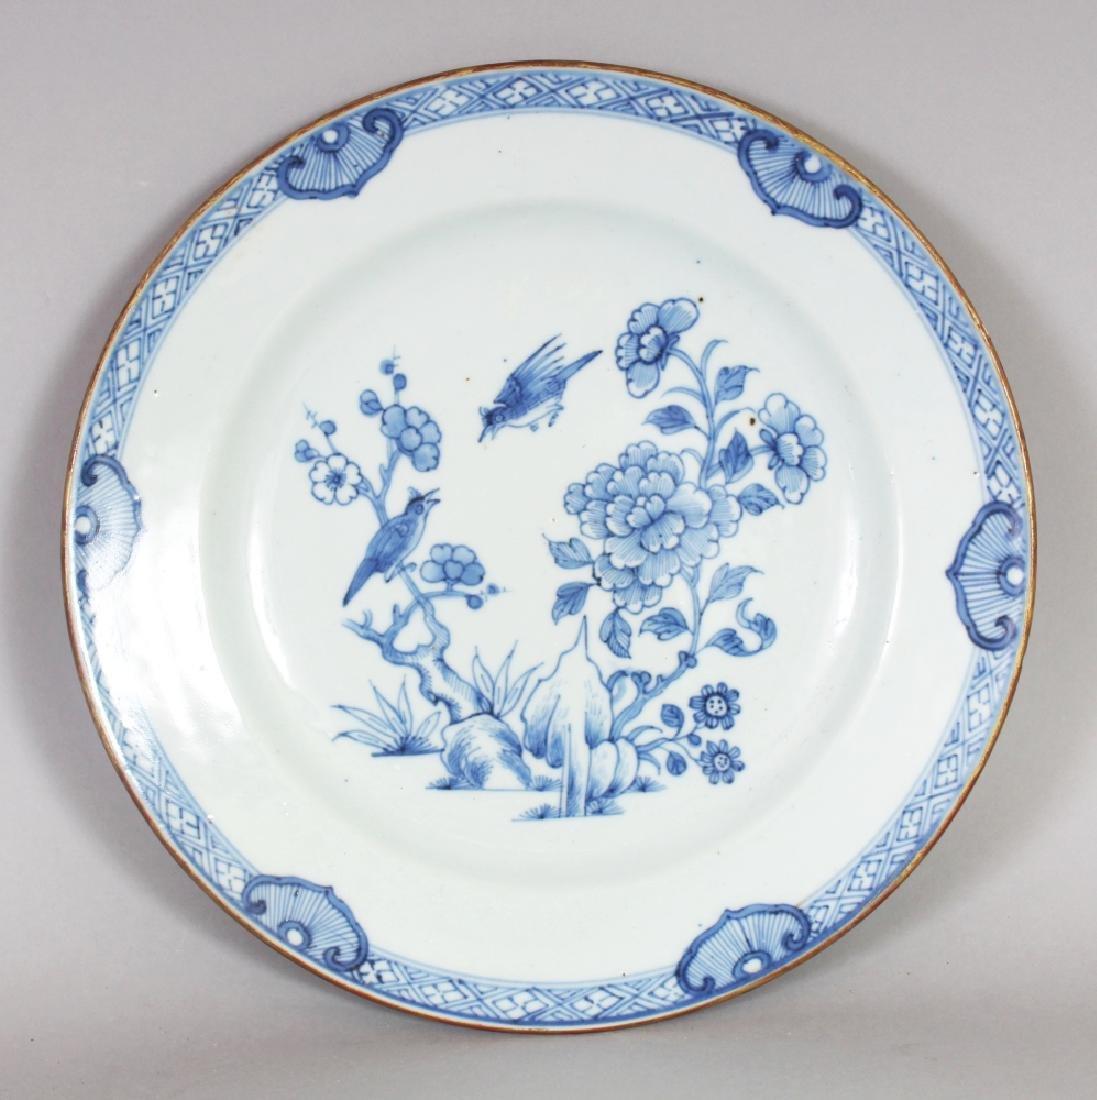 AN 18TH CENTURY CHINESE QIANLONG PERIOD BLUE & WHITE